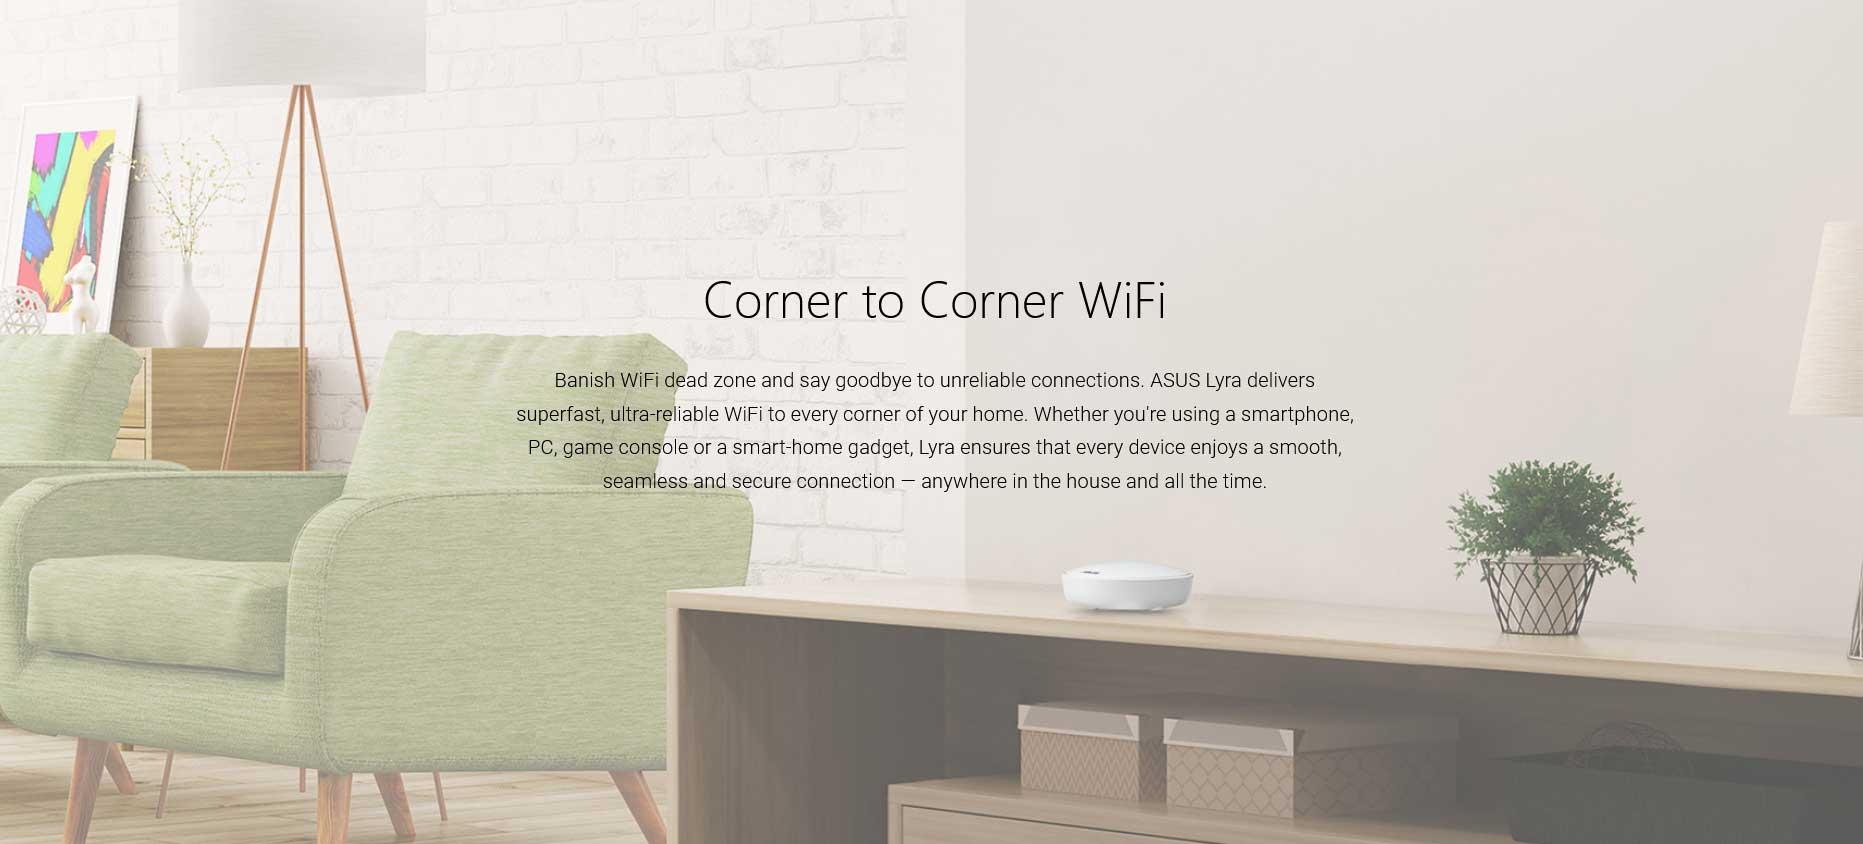 Asus Lyra 3 Pack AC2200 Whole-Home Wi-Fi System LYRA-3PK Corner to Corner Wifi